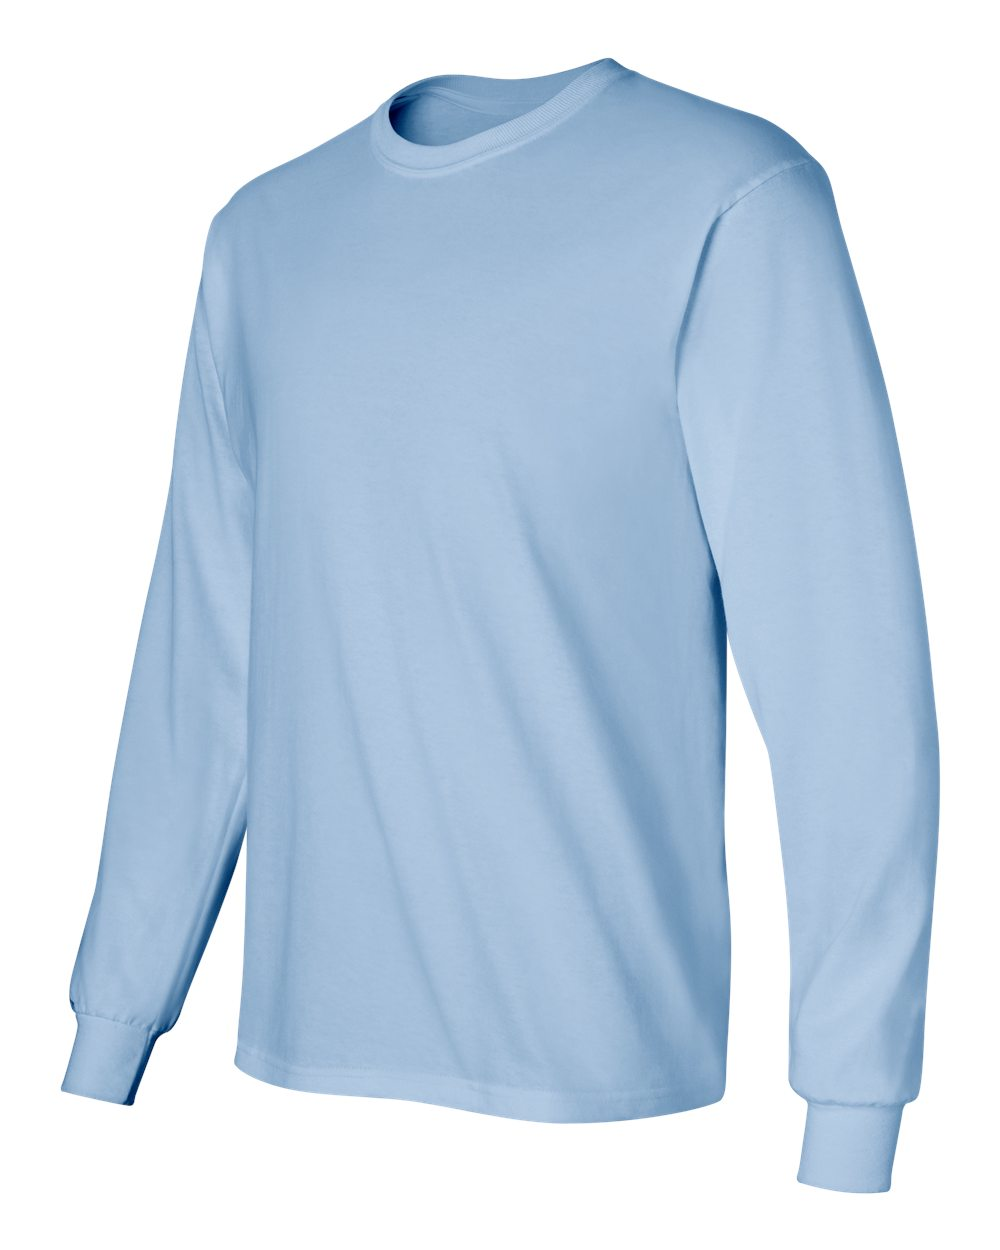 Gildan 2400 ultra cotton long sleeve t shirt friendly for Gildan t shirt printing